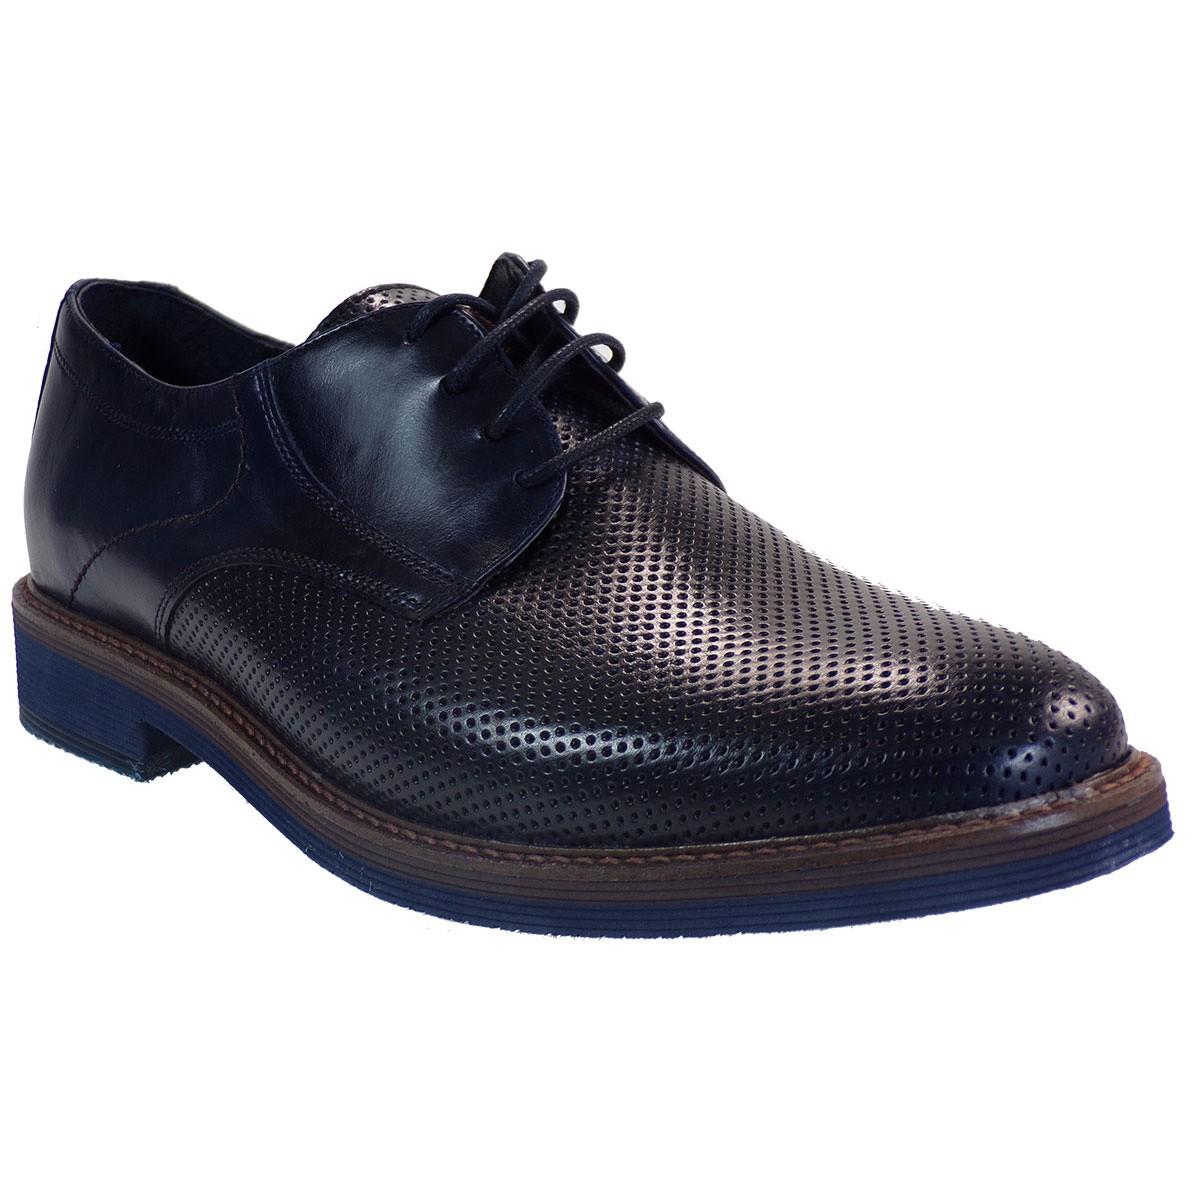 kricket Ανδρικά Παπούτσια 095 Μπλέ Δέρμα